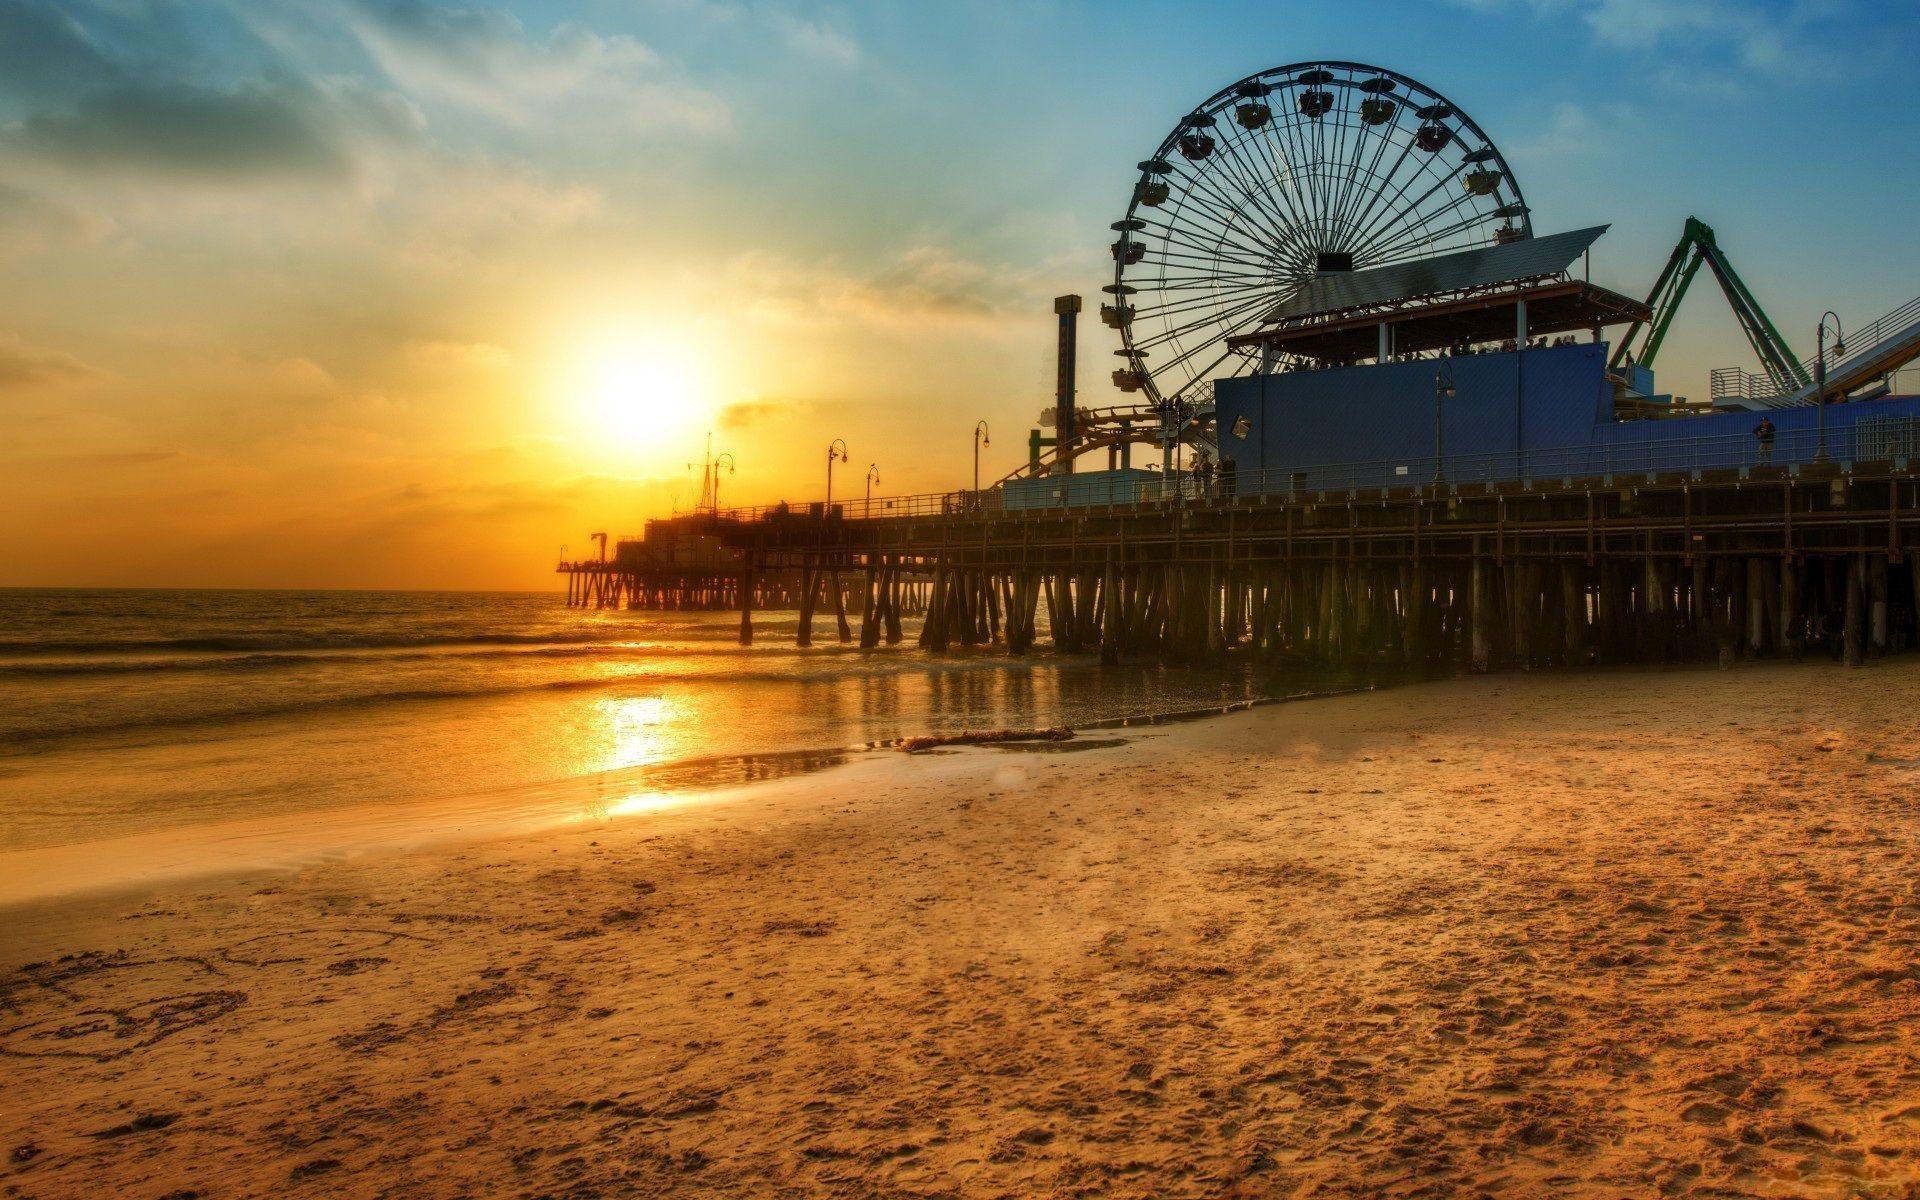 Los Angeles dock Ferris wheel, Beach sunset wonderful